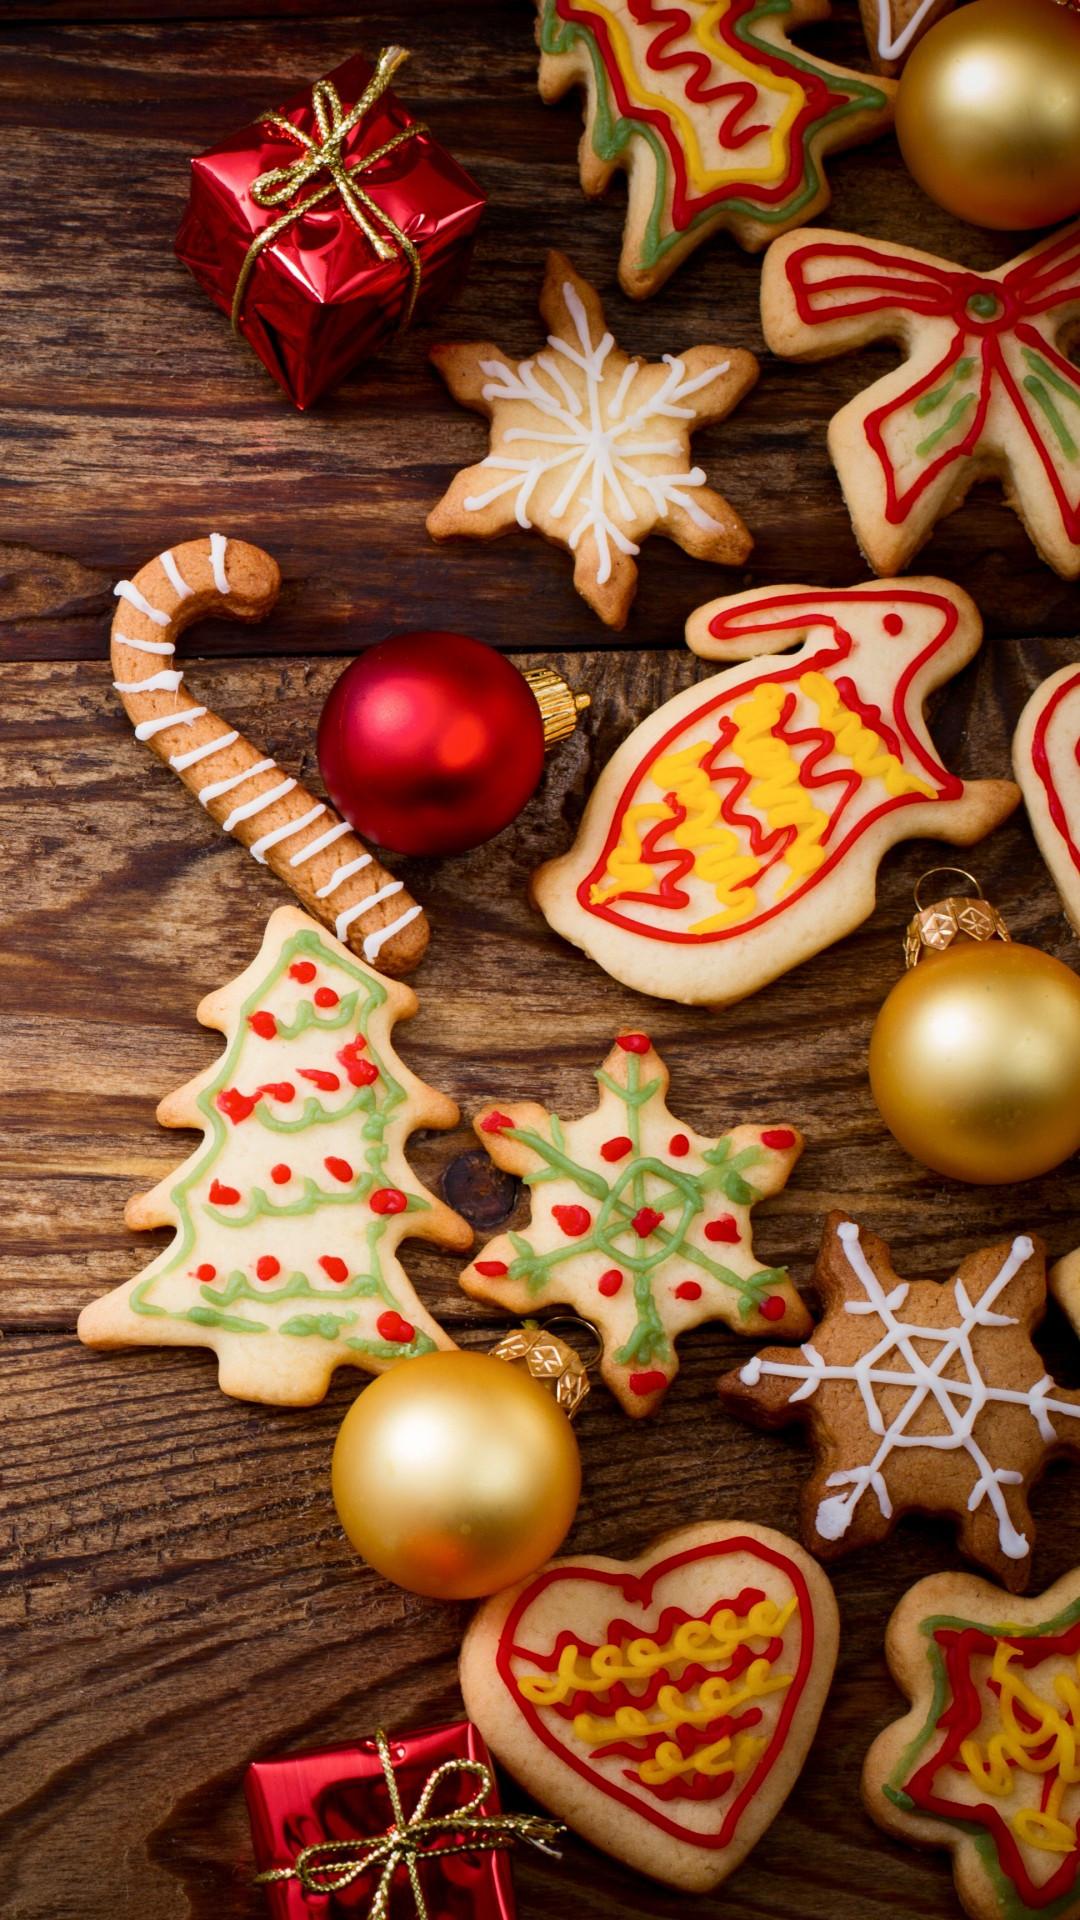 Christmas Cookies Movie 2020  Wallpaper Christmas New Year cookies 5k Holidays